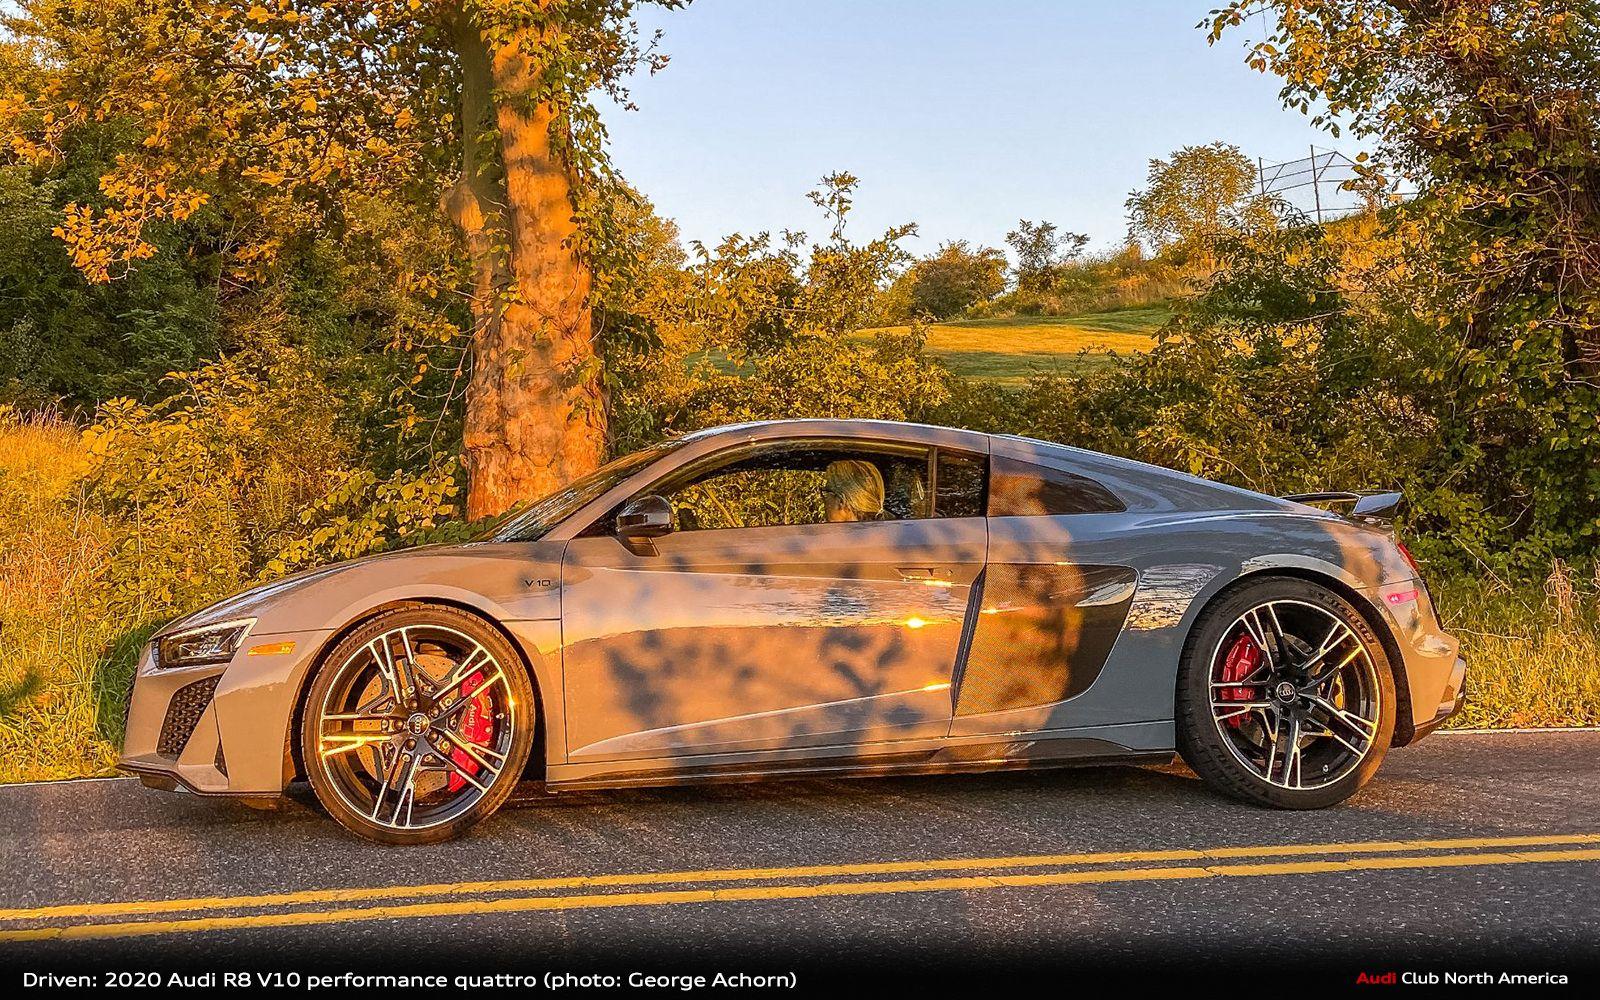 Driven 2020 Audi R8 V10 Performance Quattro 88 Audi Club North America